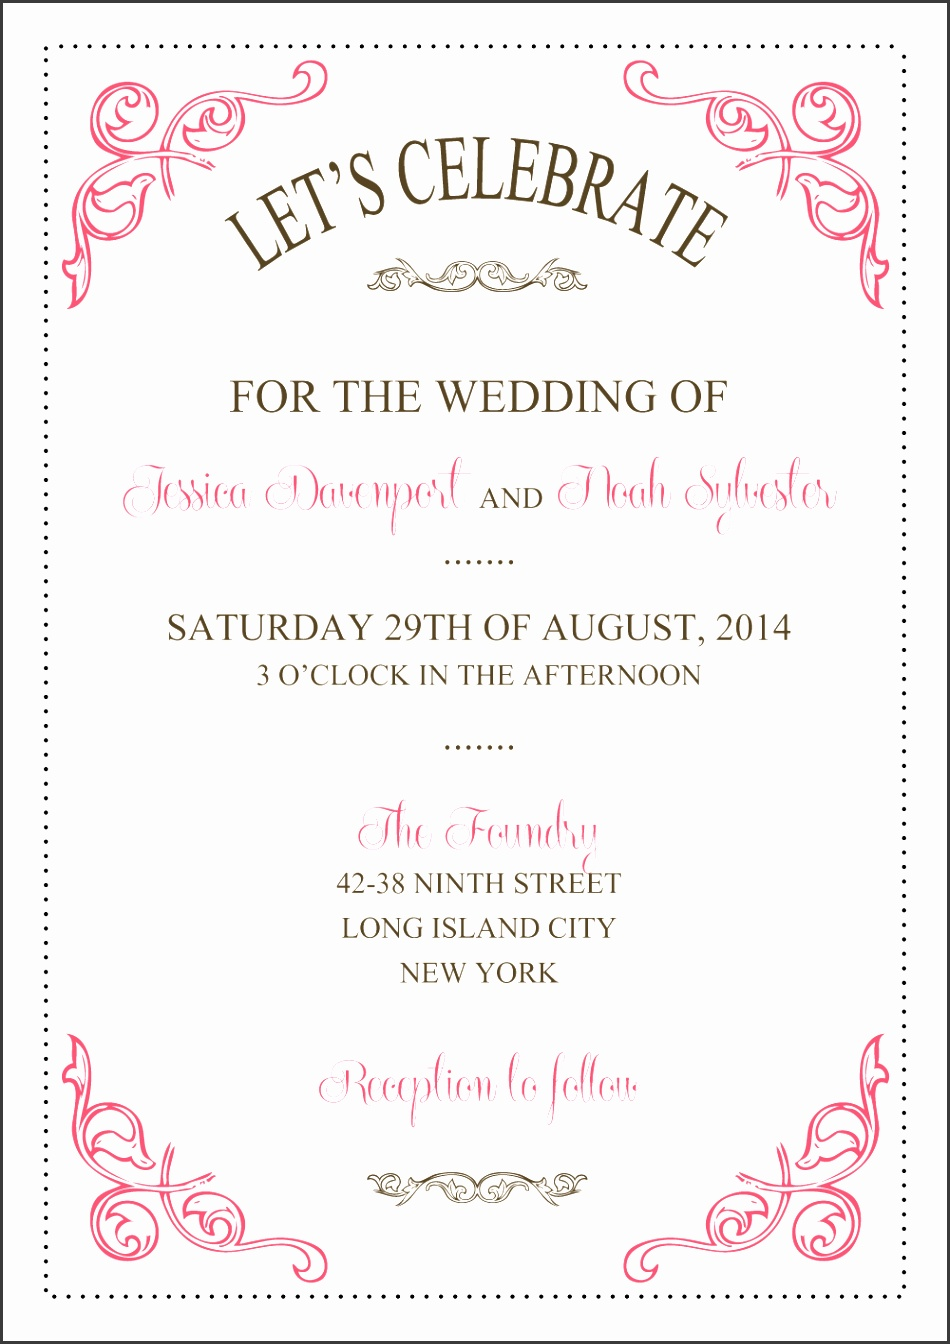 Free New Vintage Swirls Wedding Invitation Template At Wedding Invitation Templates